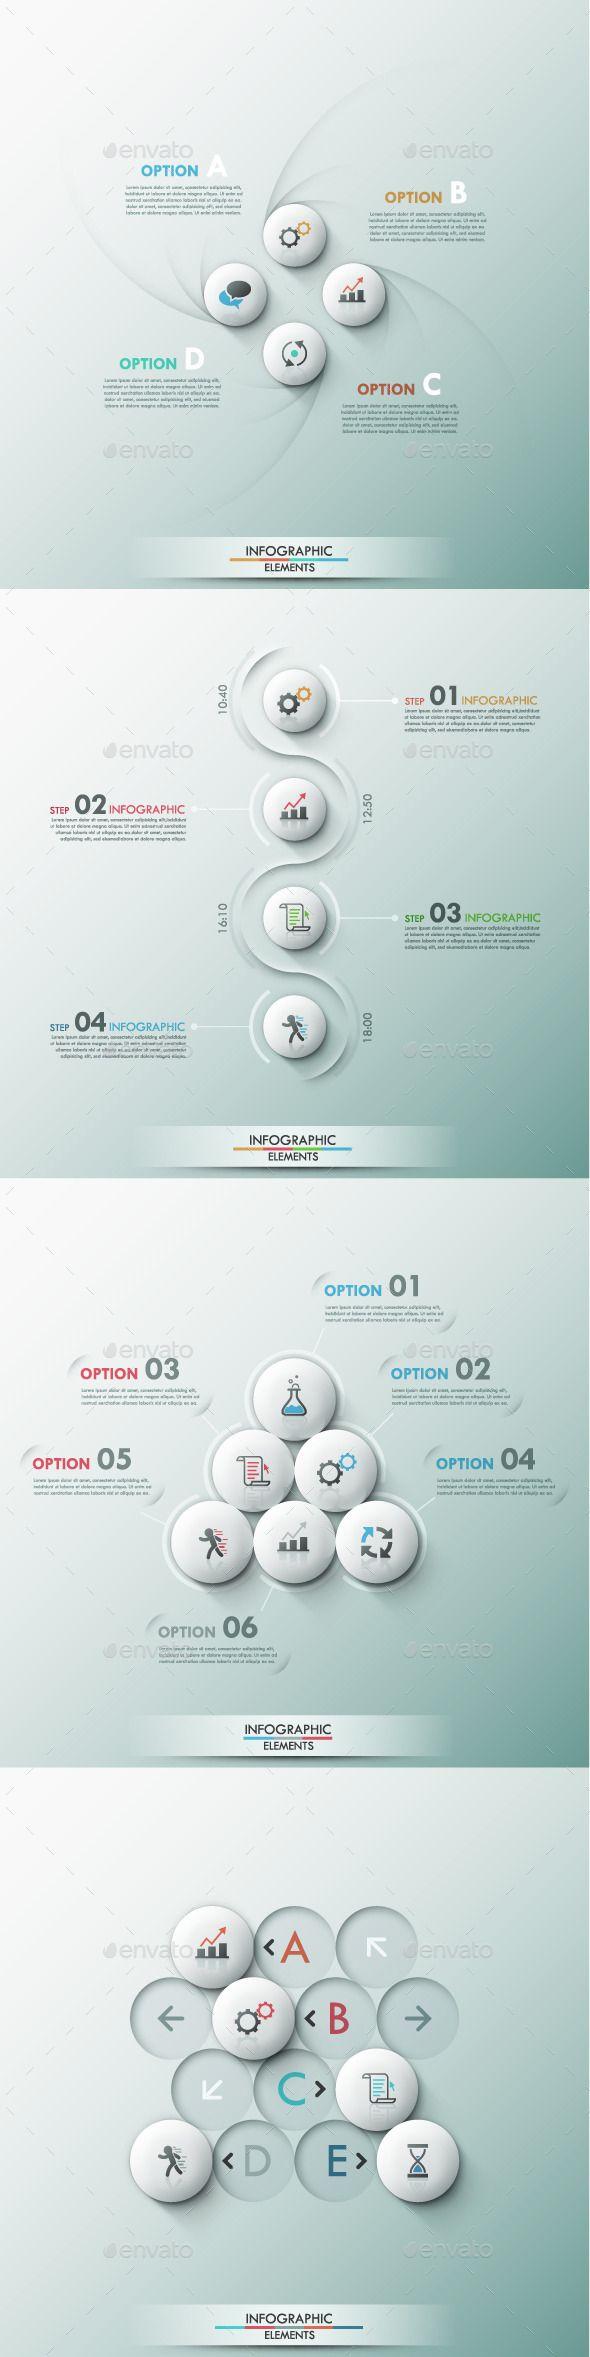 Set of 4 Modern Infographic Template #design Download: http://graphicriver.net/item/set-of-4-modern-infographic-templates/9449510?ref=ksioks